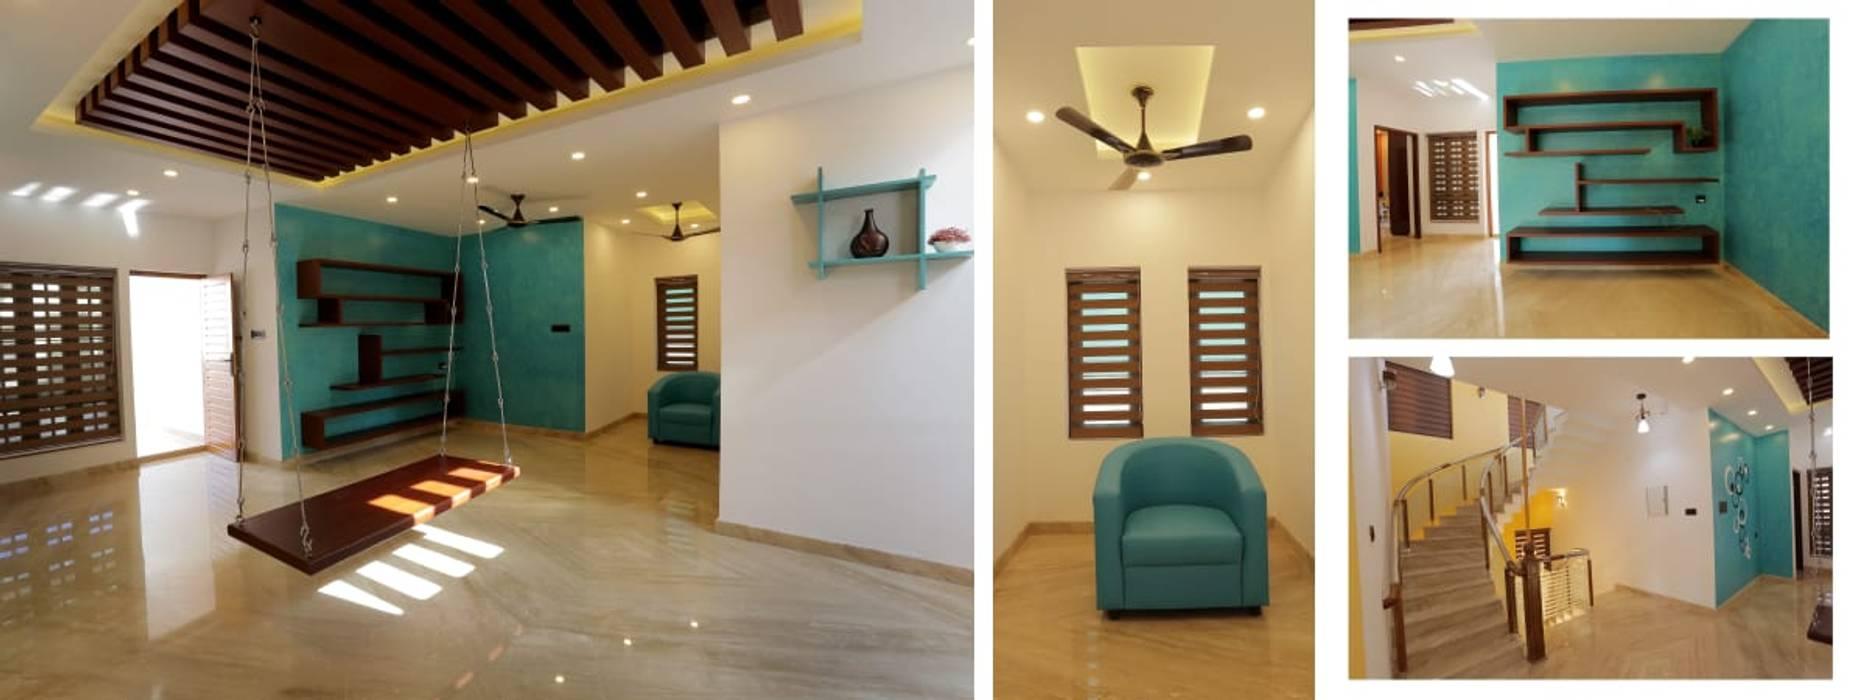 Villa Project in Ambalamukku:  Corridor & hallway by Paramount Construction & Decor,Asian